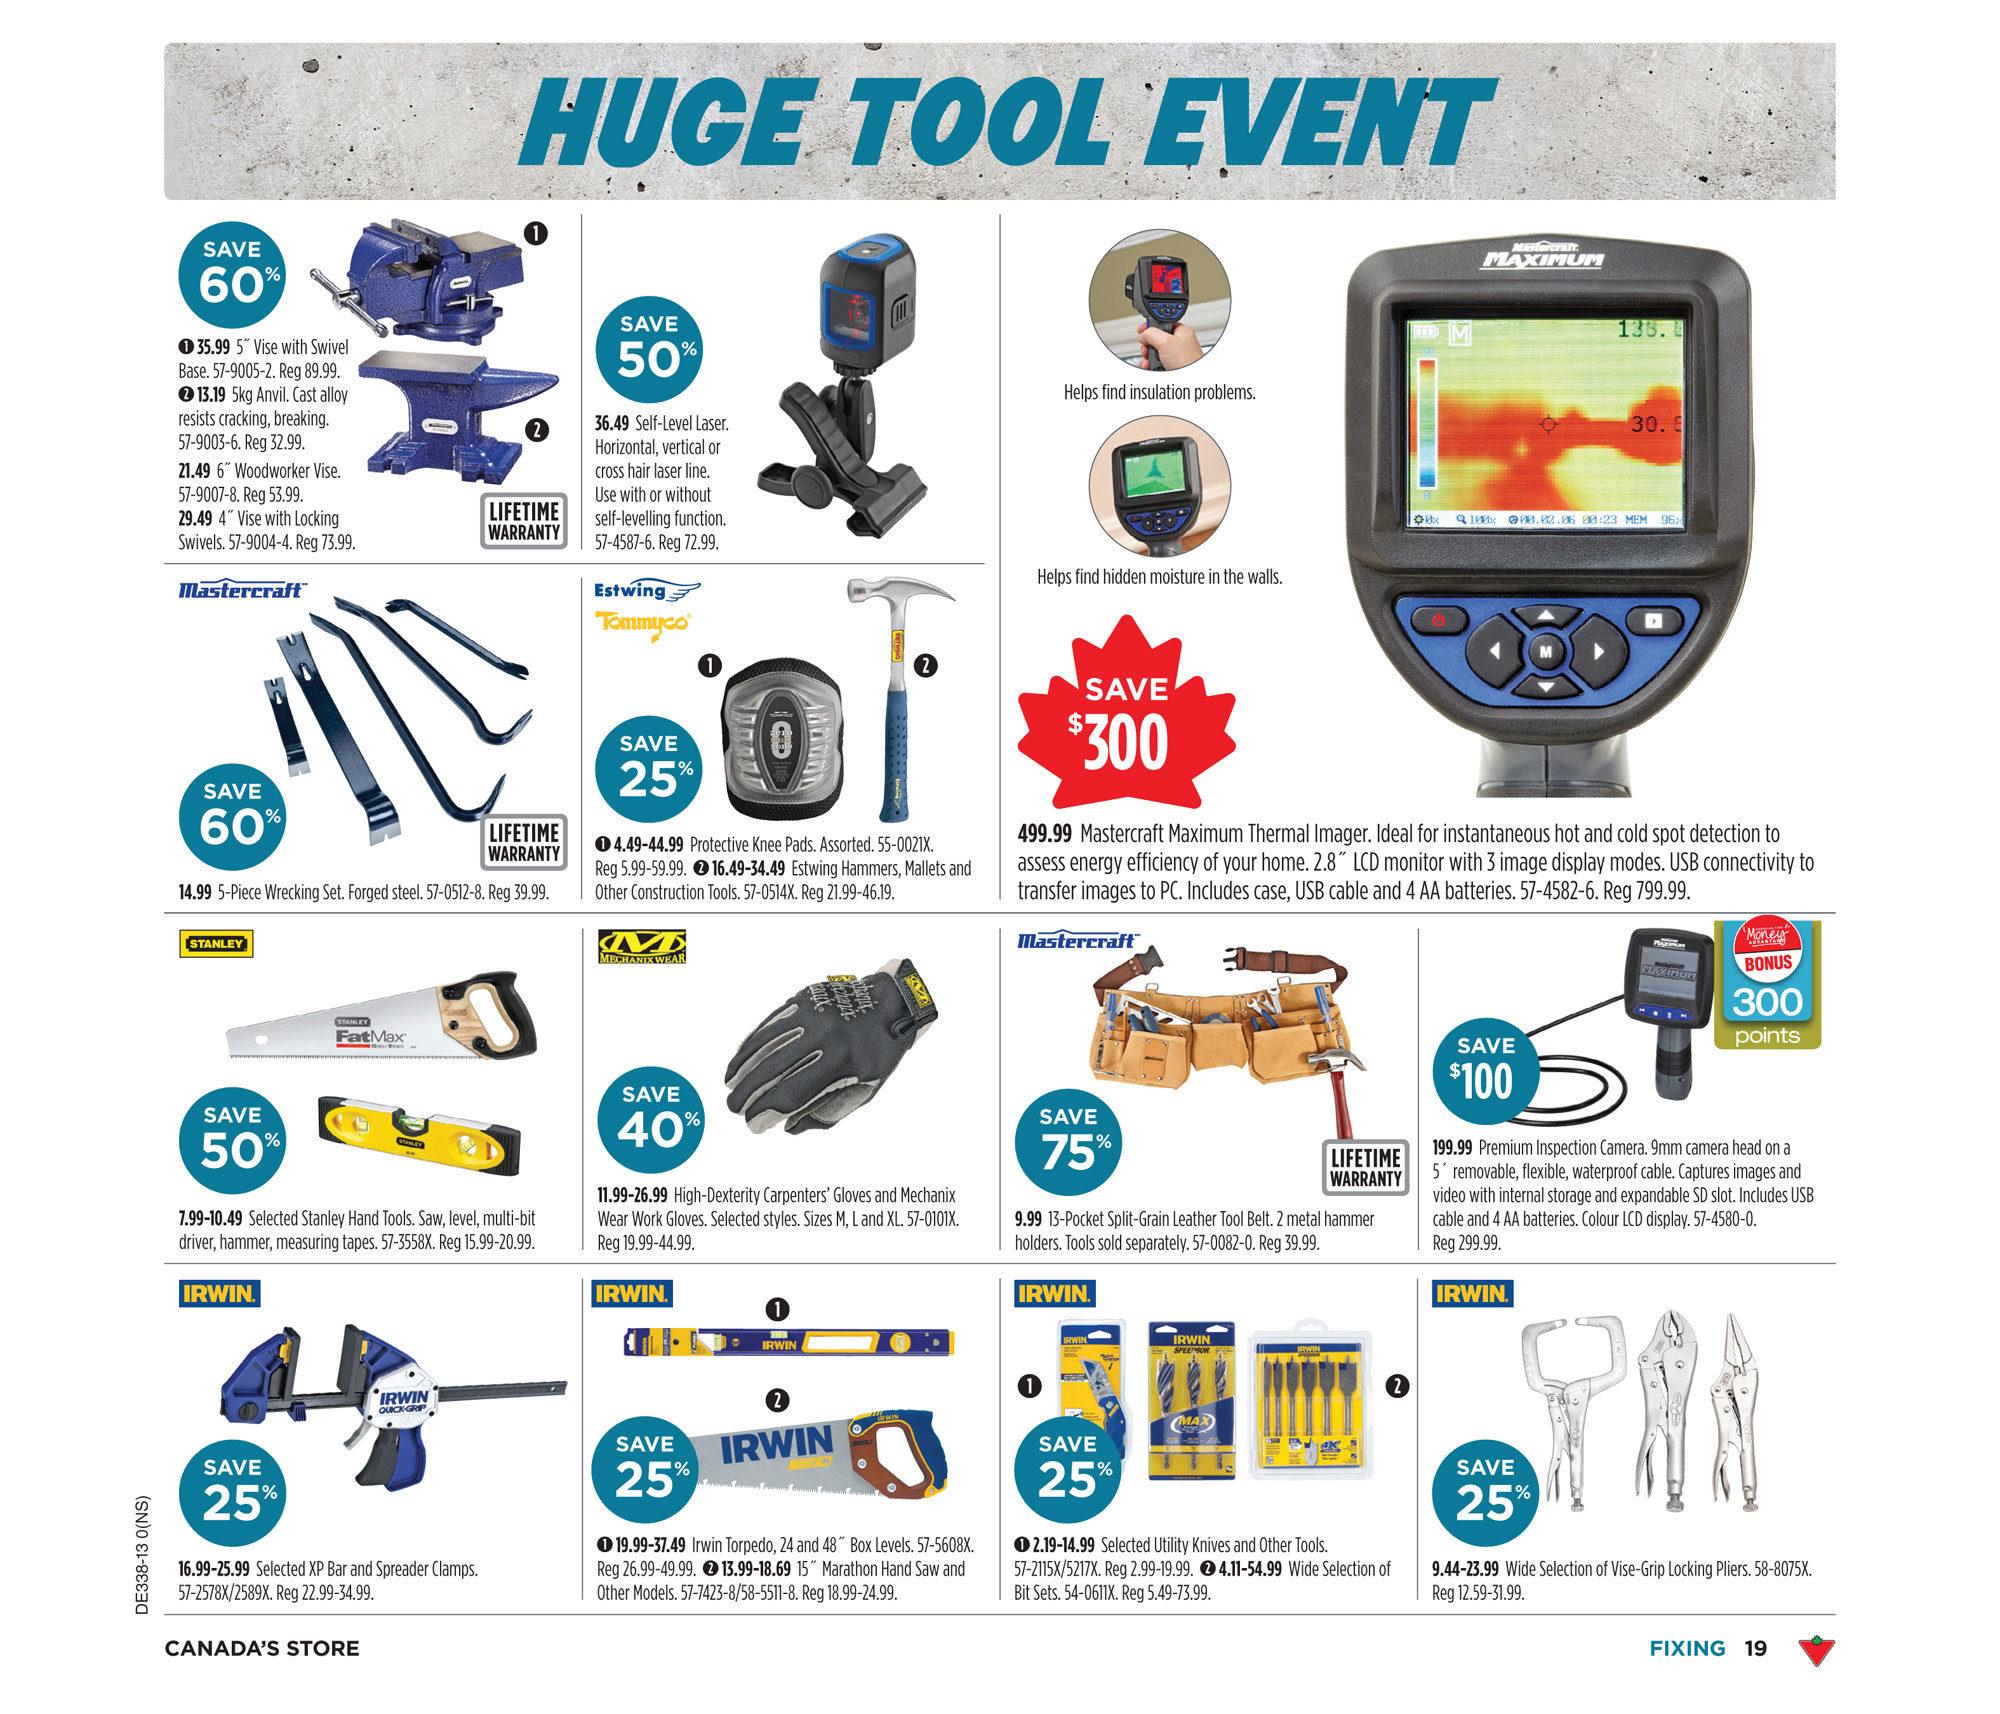 Canadian Tire Weekly Flyer Sep 12 19 Kotak Dvd Double 9mm Gt Pro